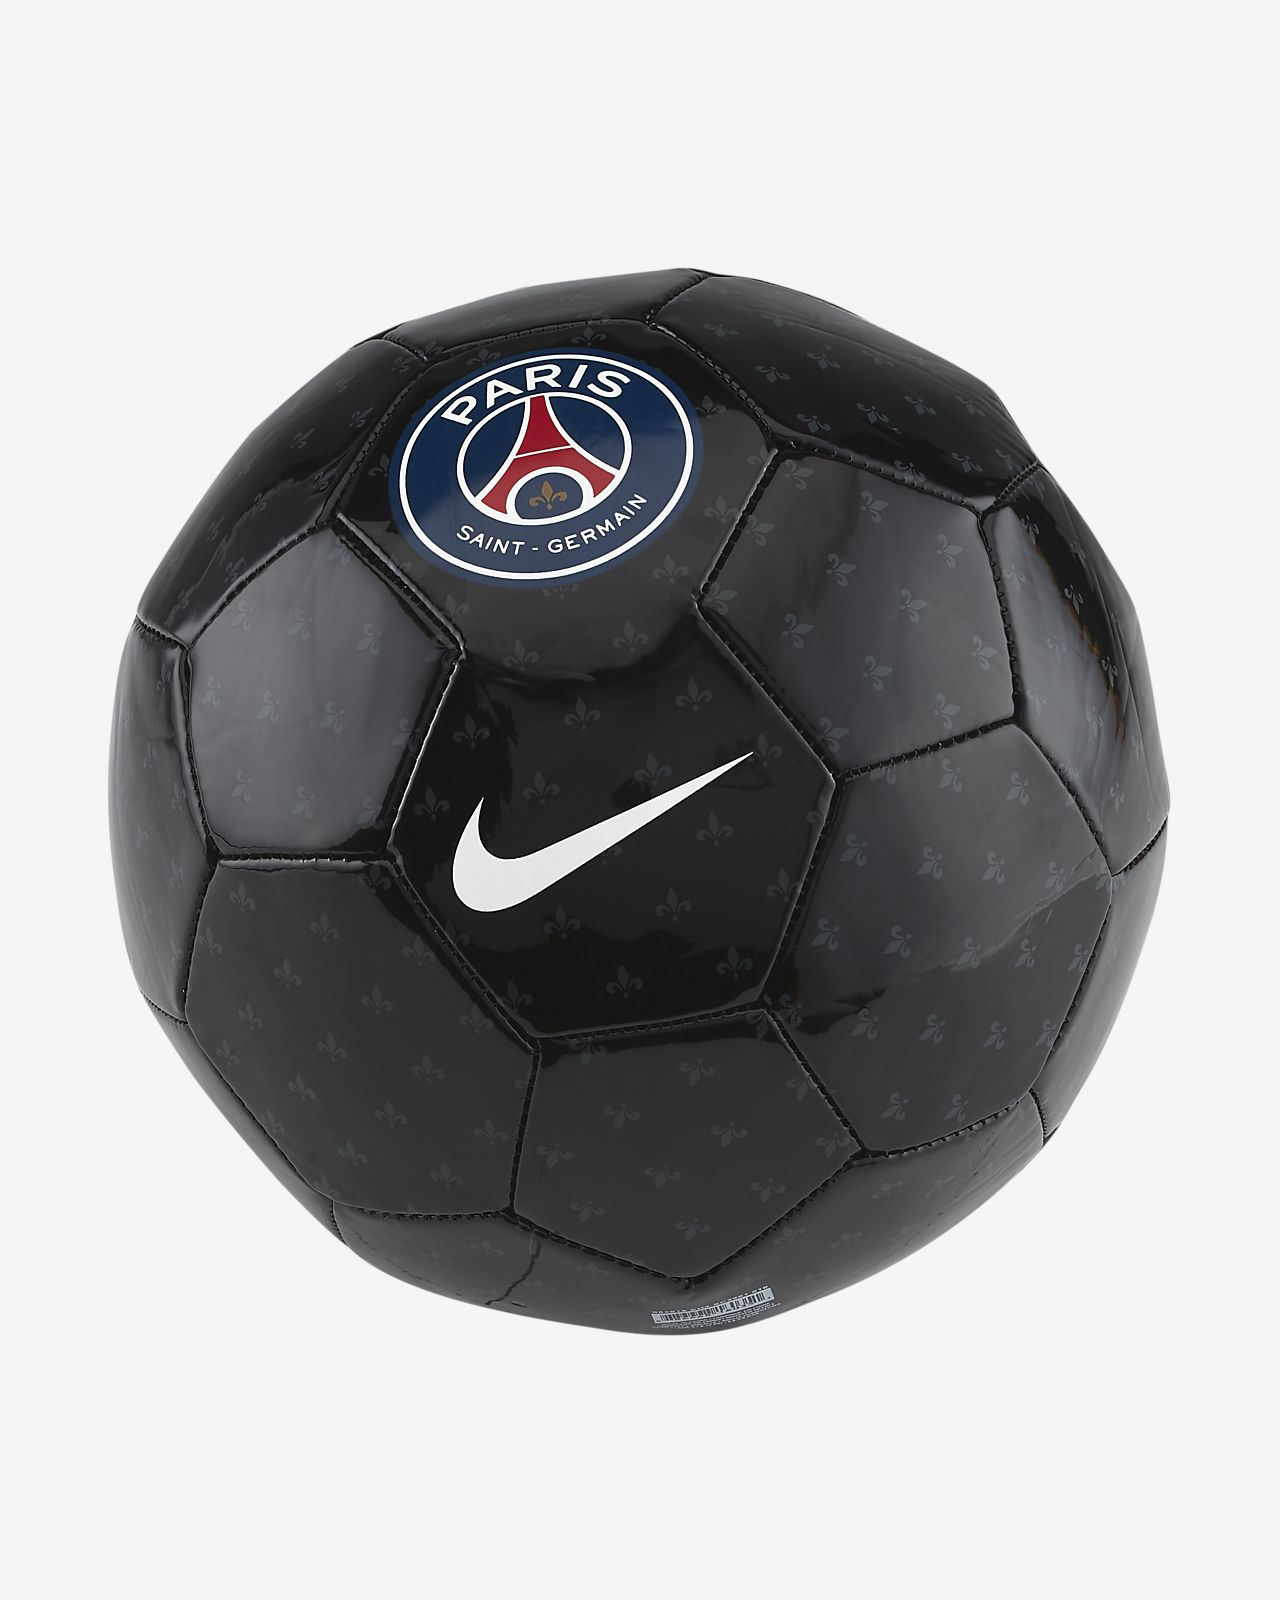 De Football Fr Germain Saint Supporters Paris Ballon a7xHqFF